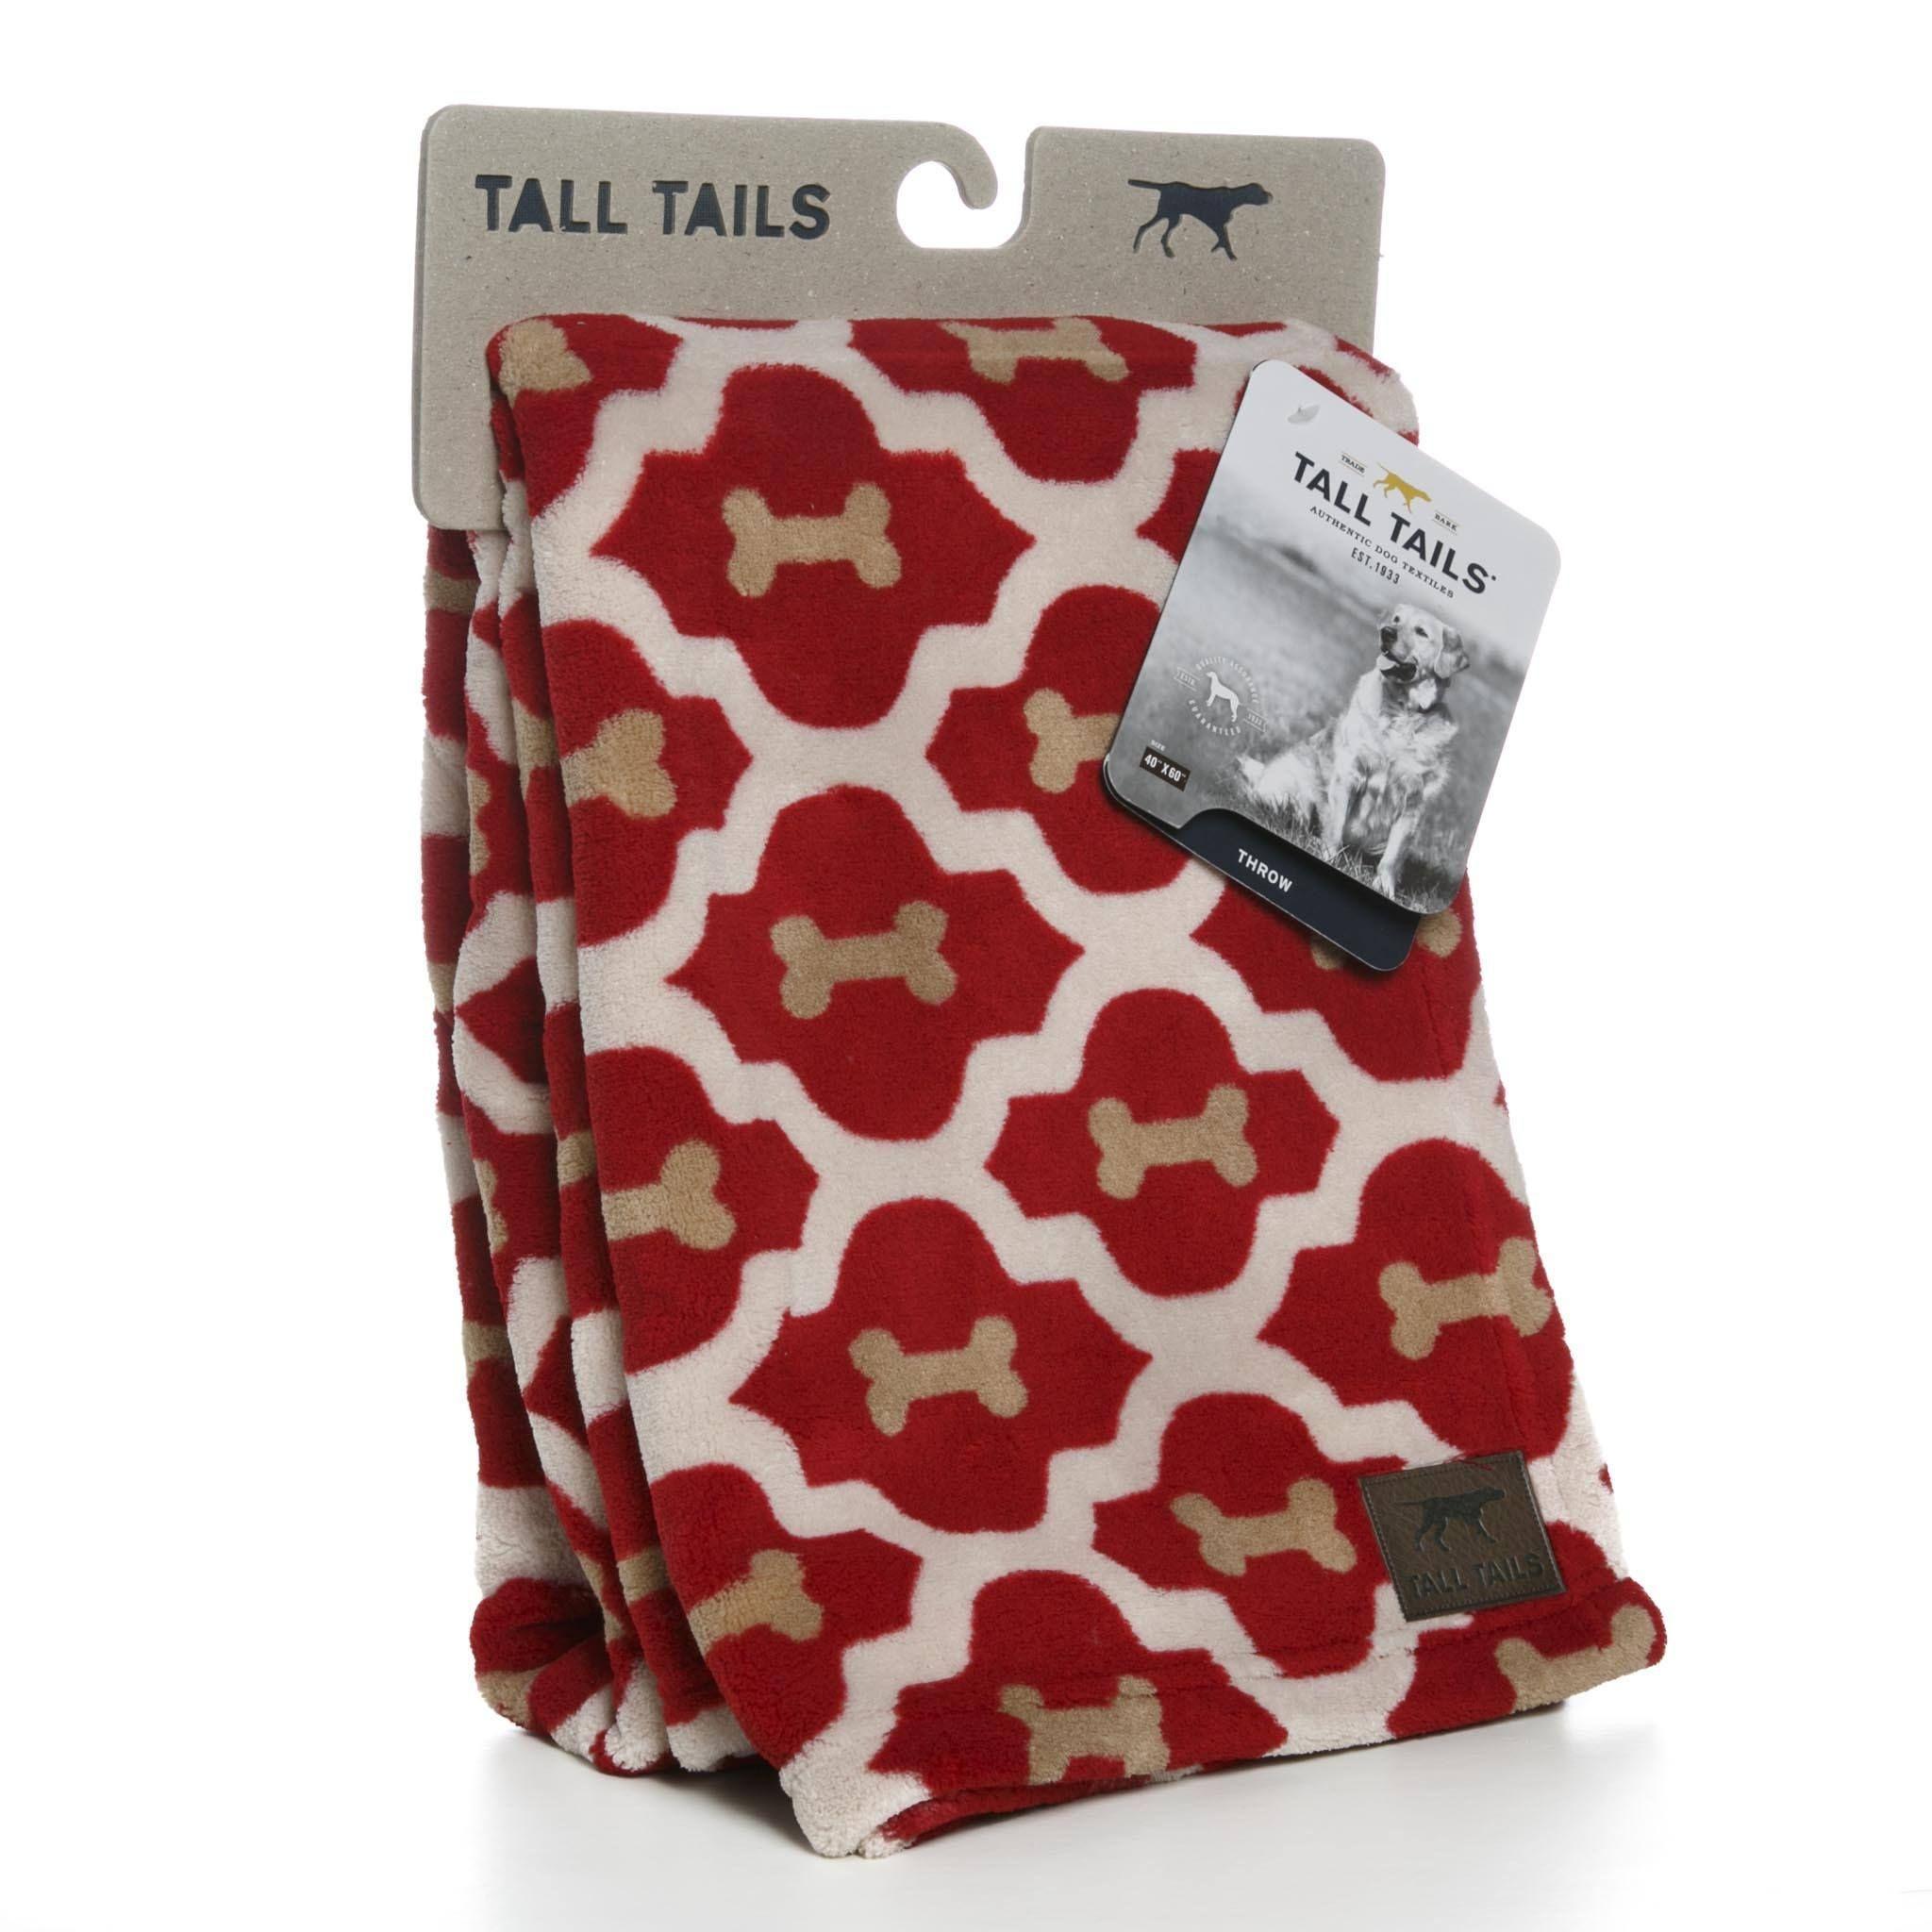 Tall TailsDog Bed Blanket Red Bone Red bone, Red, Blanket